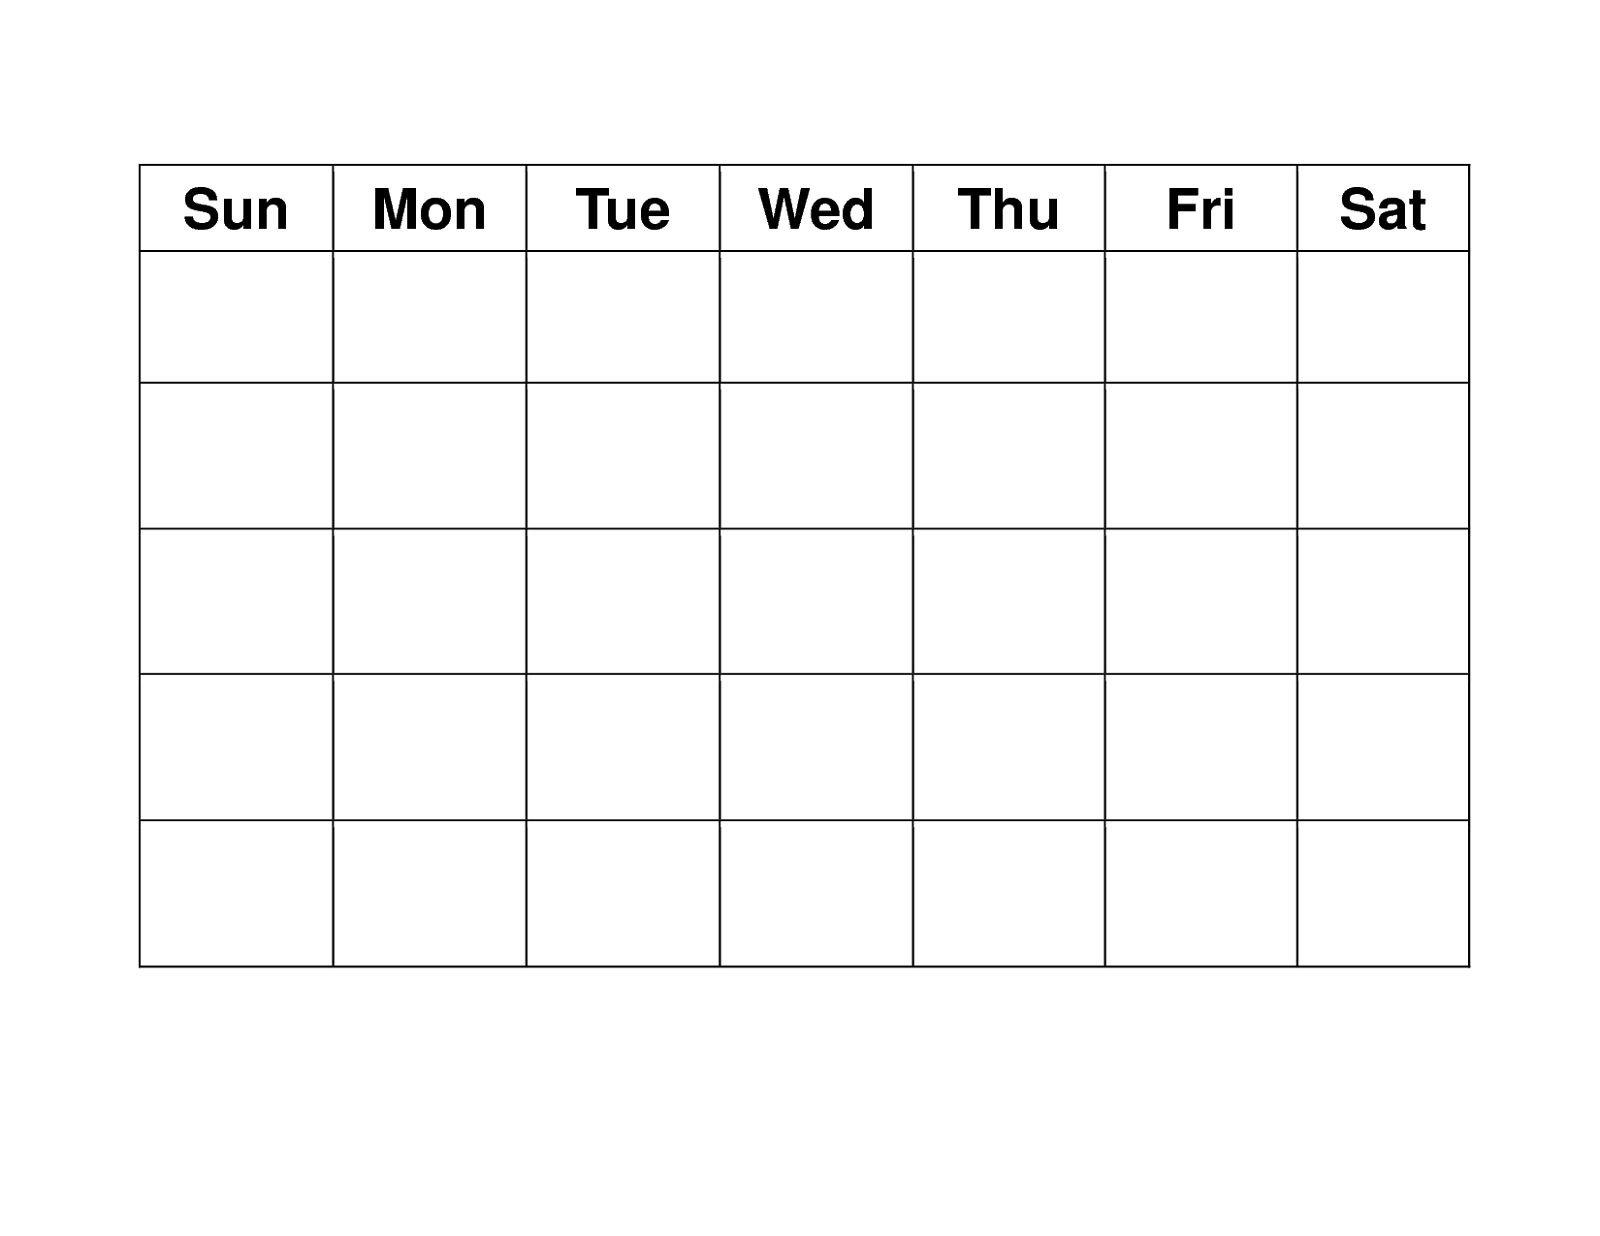 Get Blank Weekly Calendar To Fill In | Blank Calendar Calendar To Fill In And Print